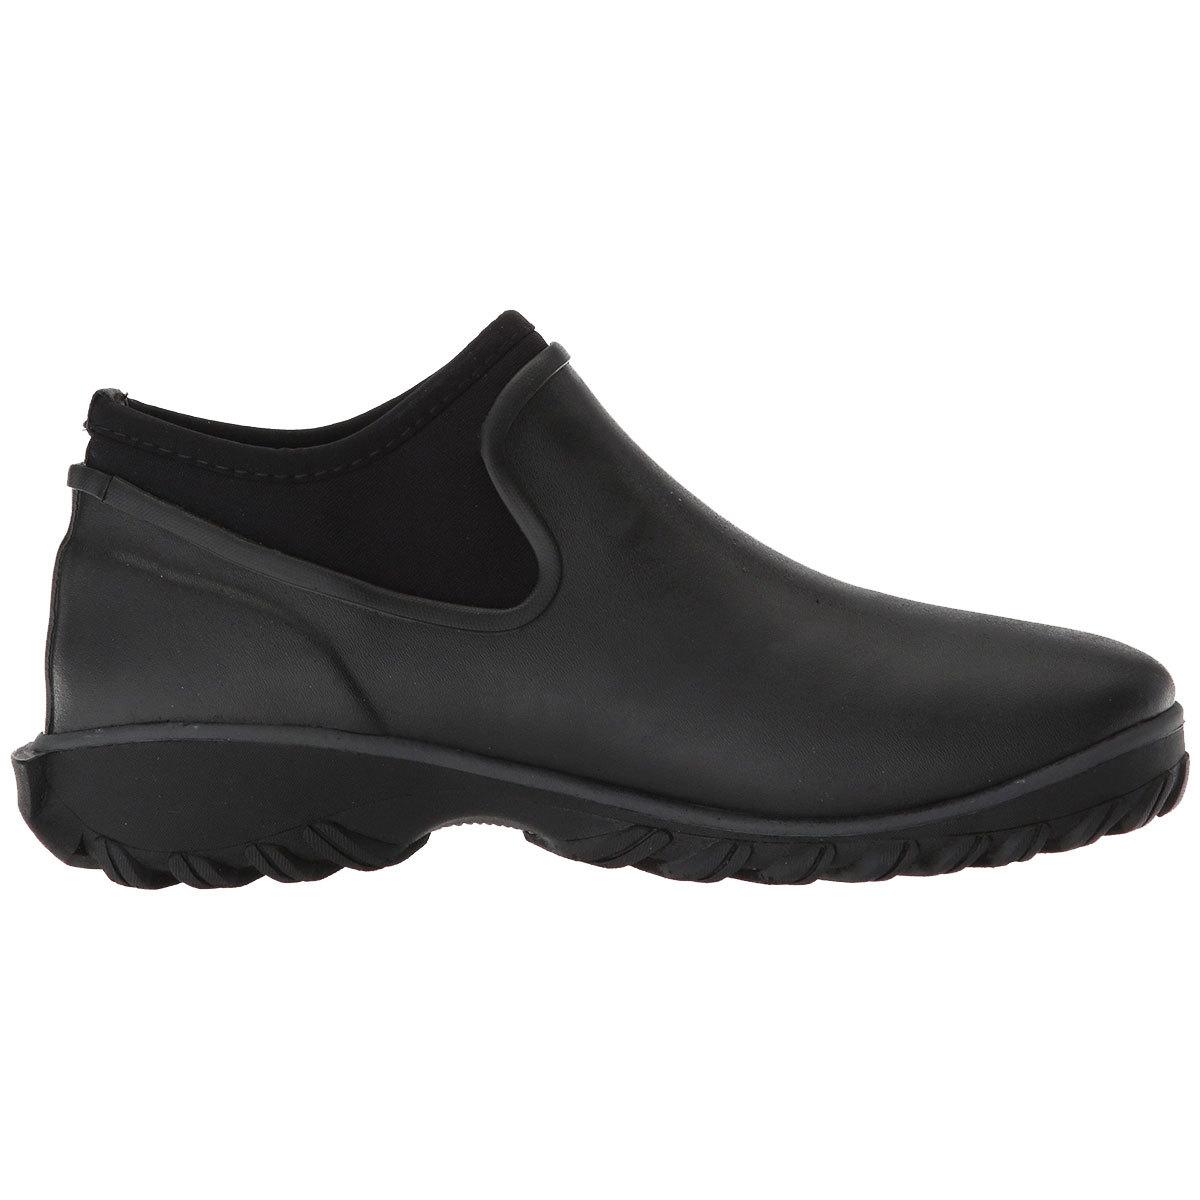 Bogs Women's Sauvie Chelsea Waterproof Insulated Storm Shoes - Black, 9